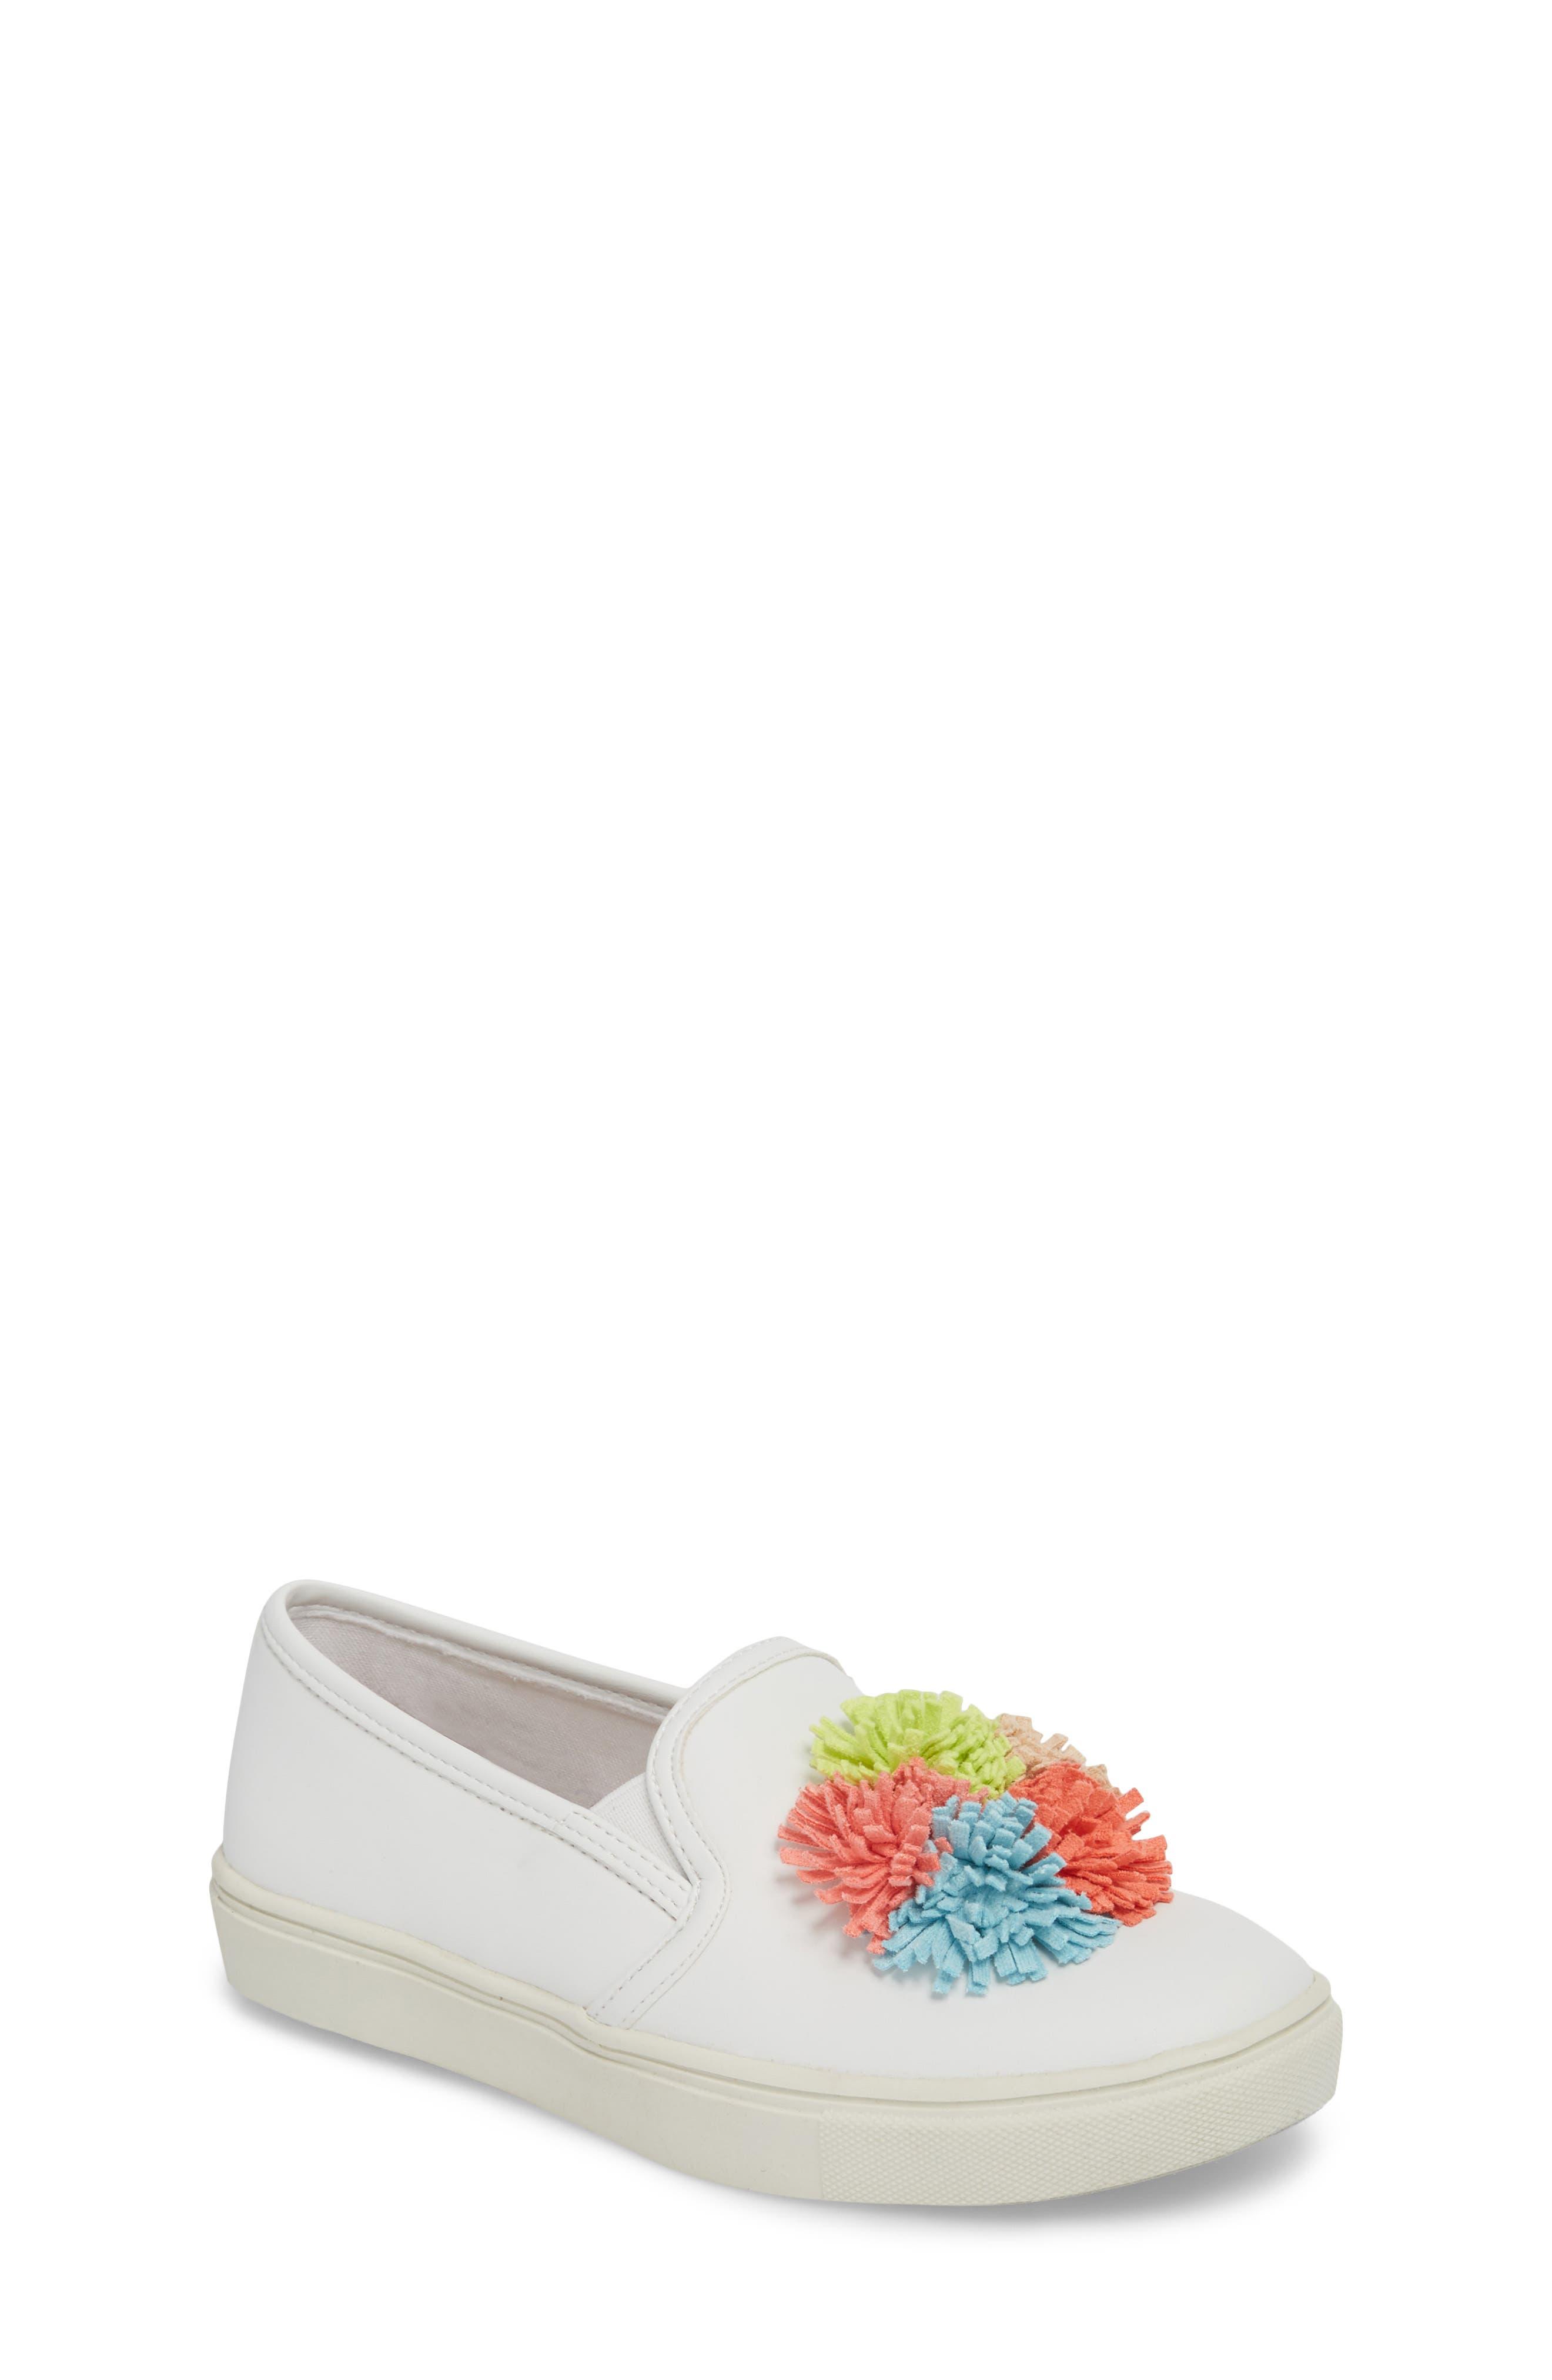 Twiny Pompom Slip-On Sneaker,                         Main,                         color, 100